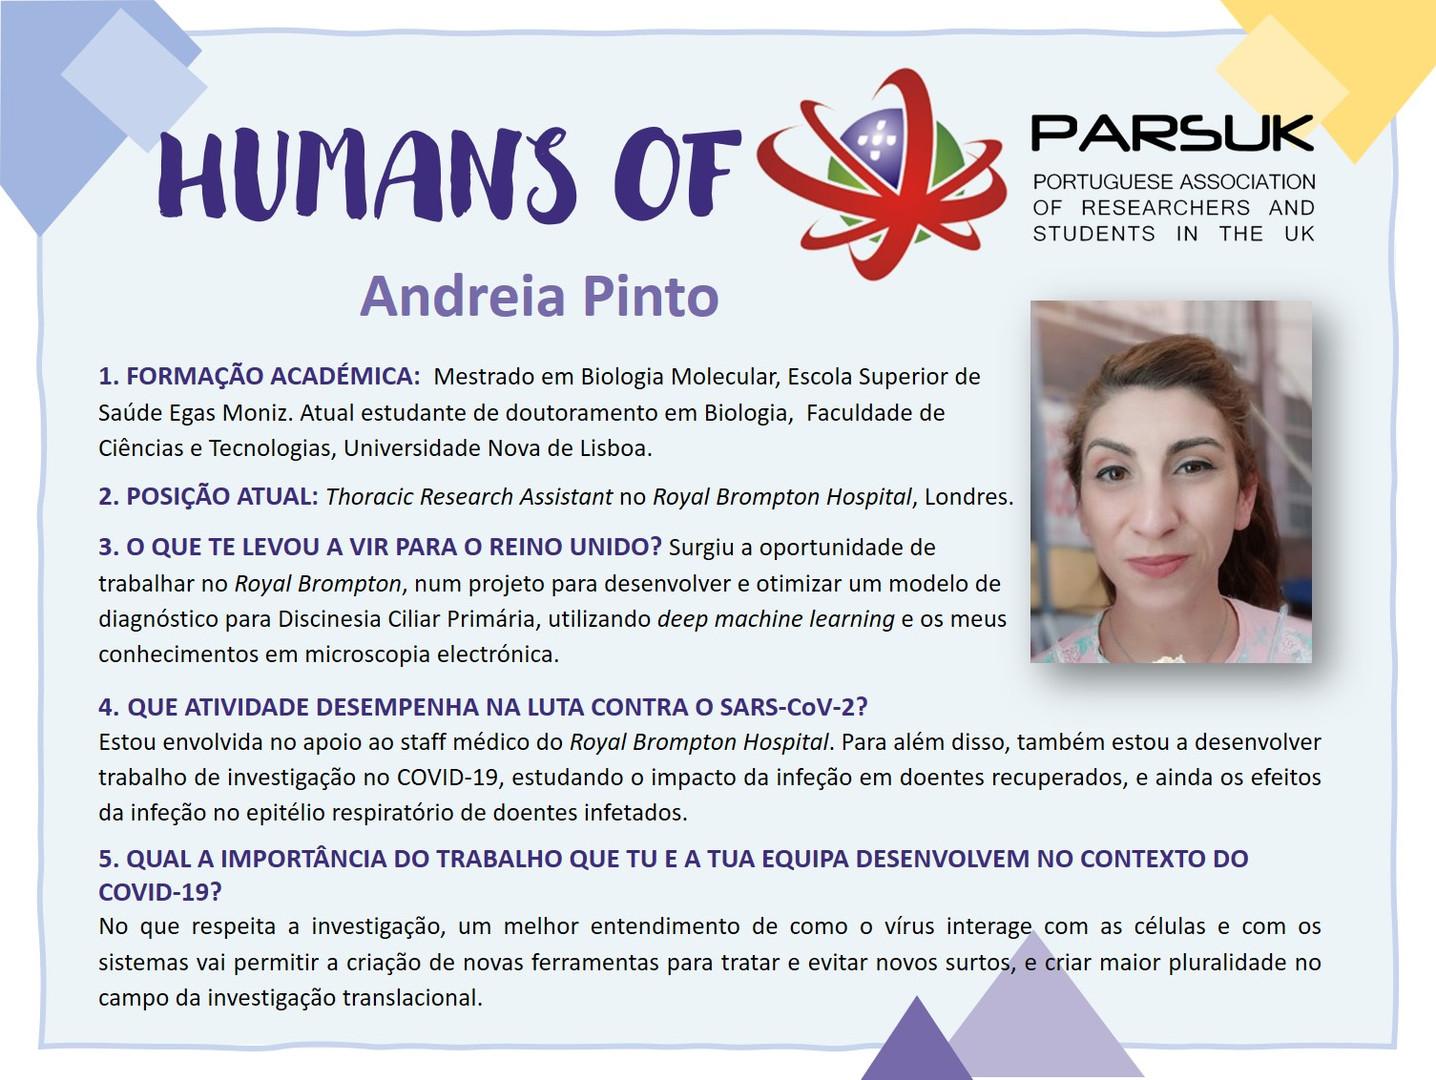 1.Andreia Pinto.jpg